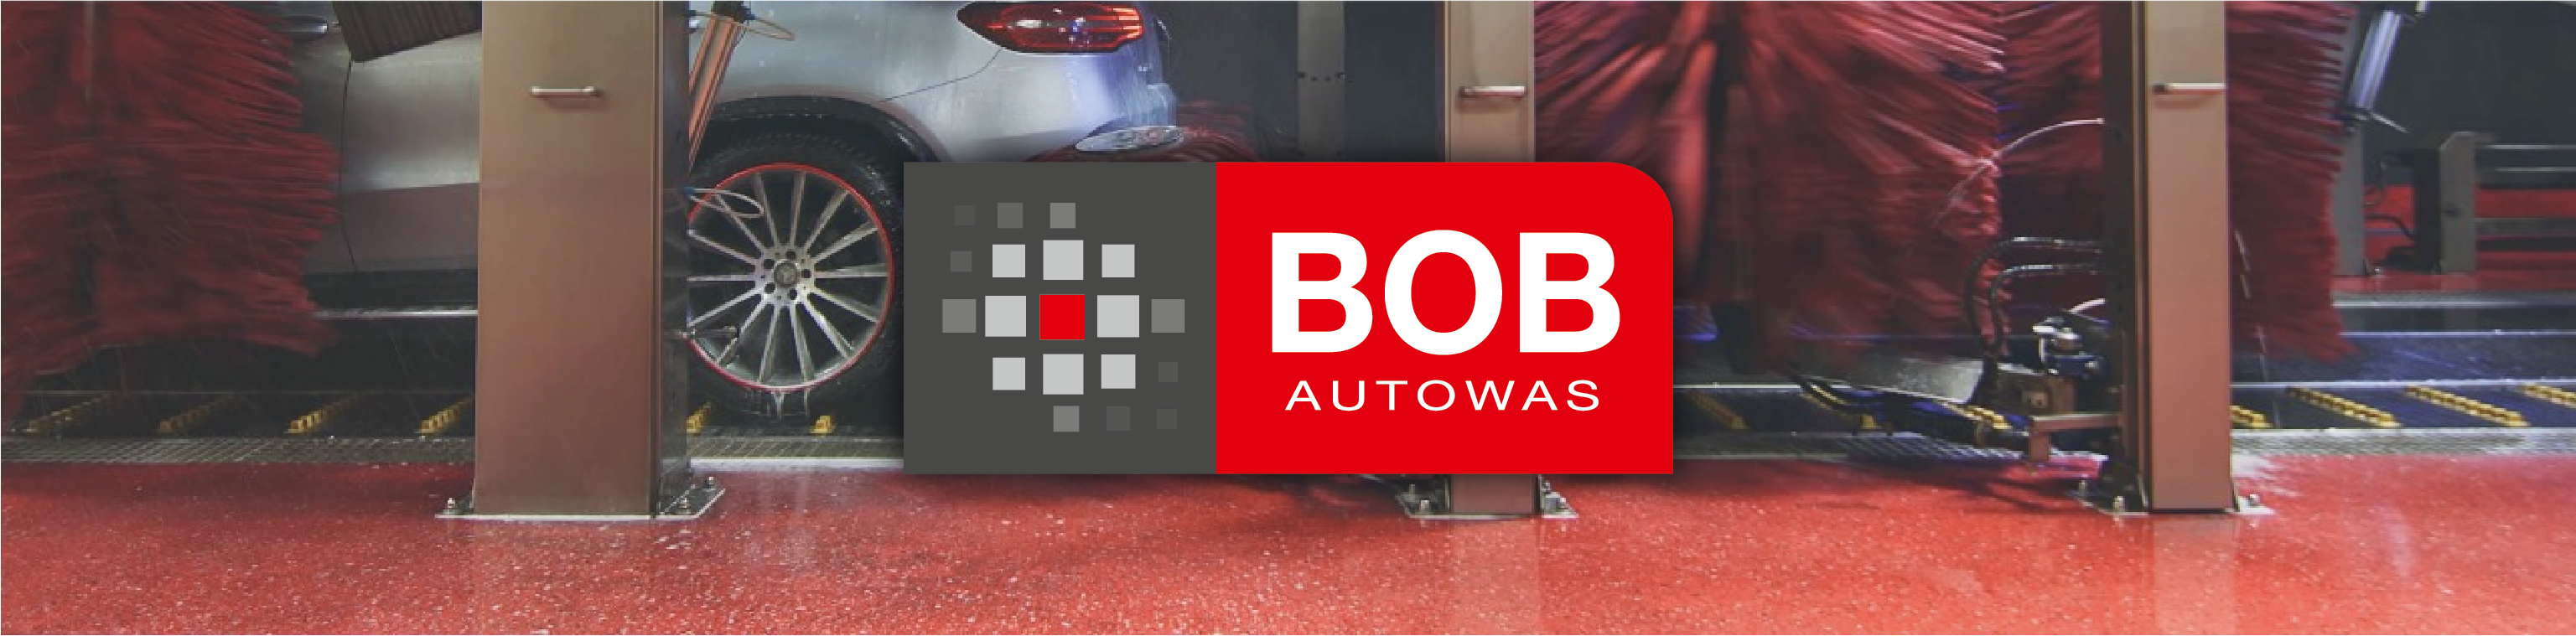 Bob's Carwash